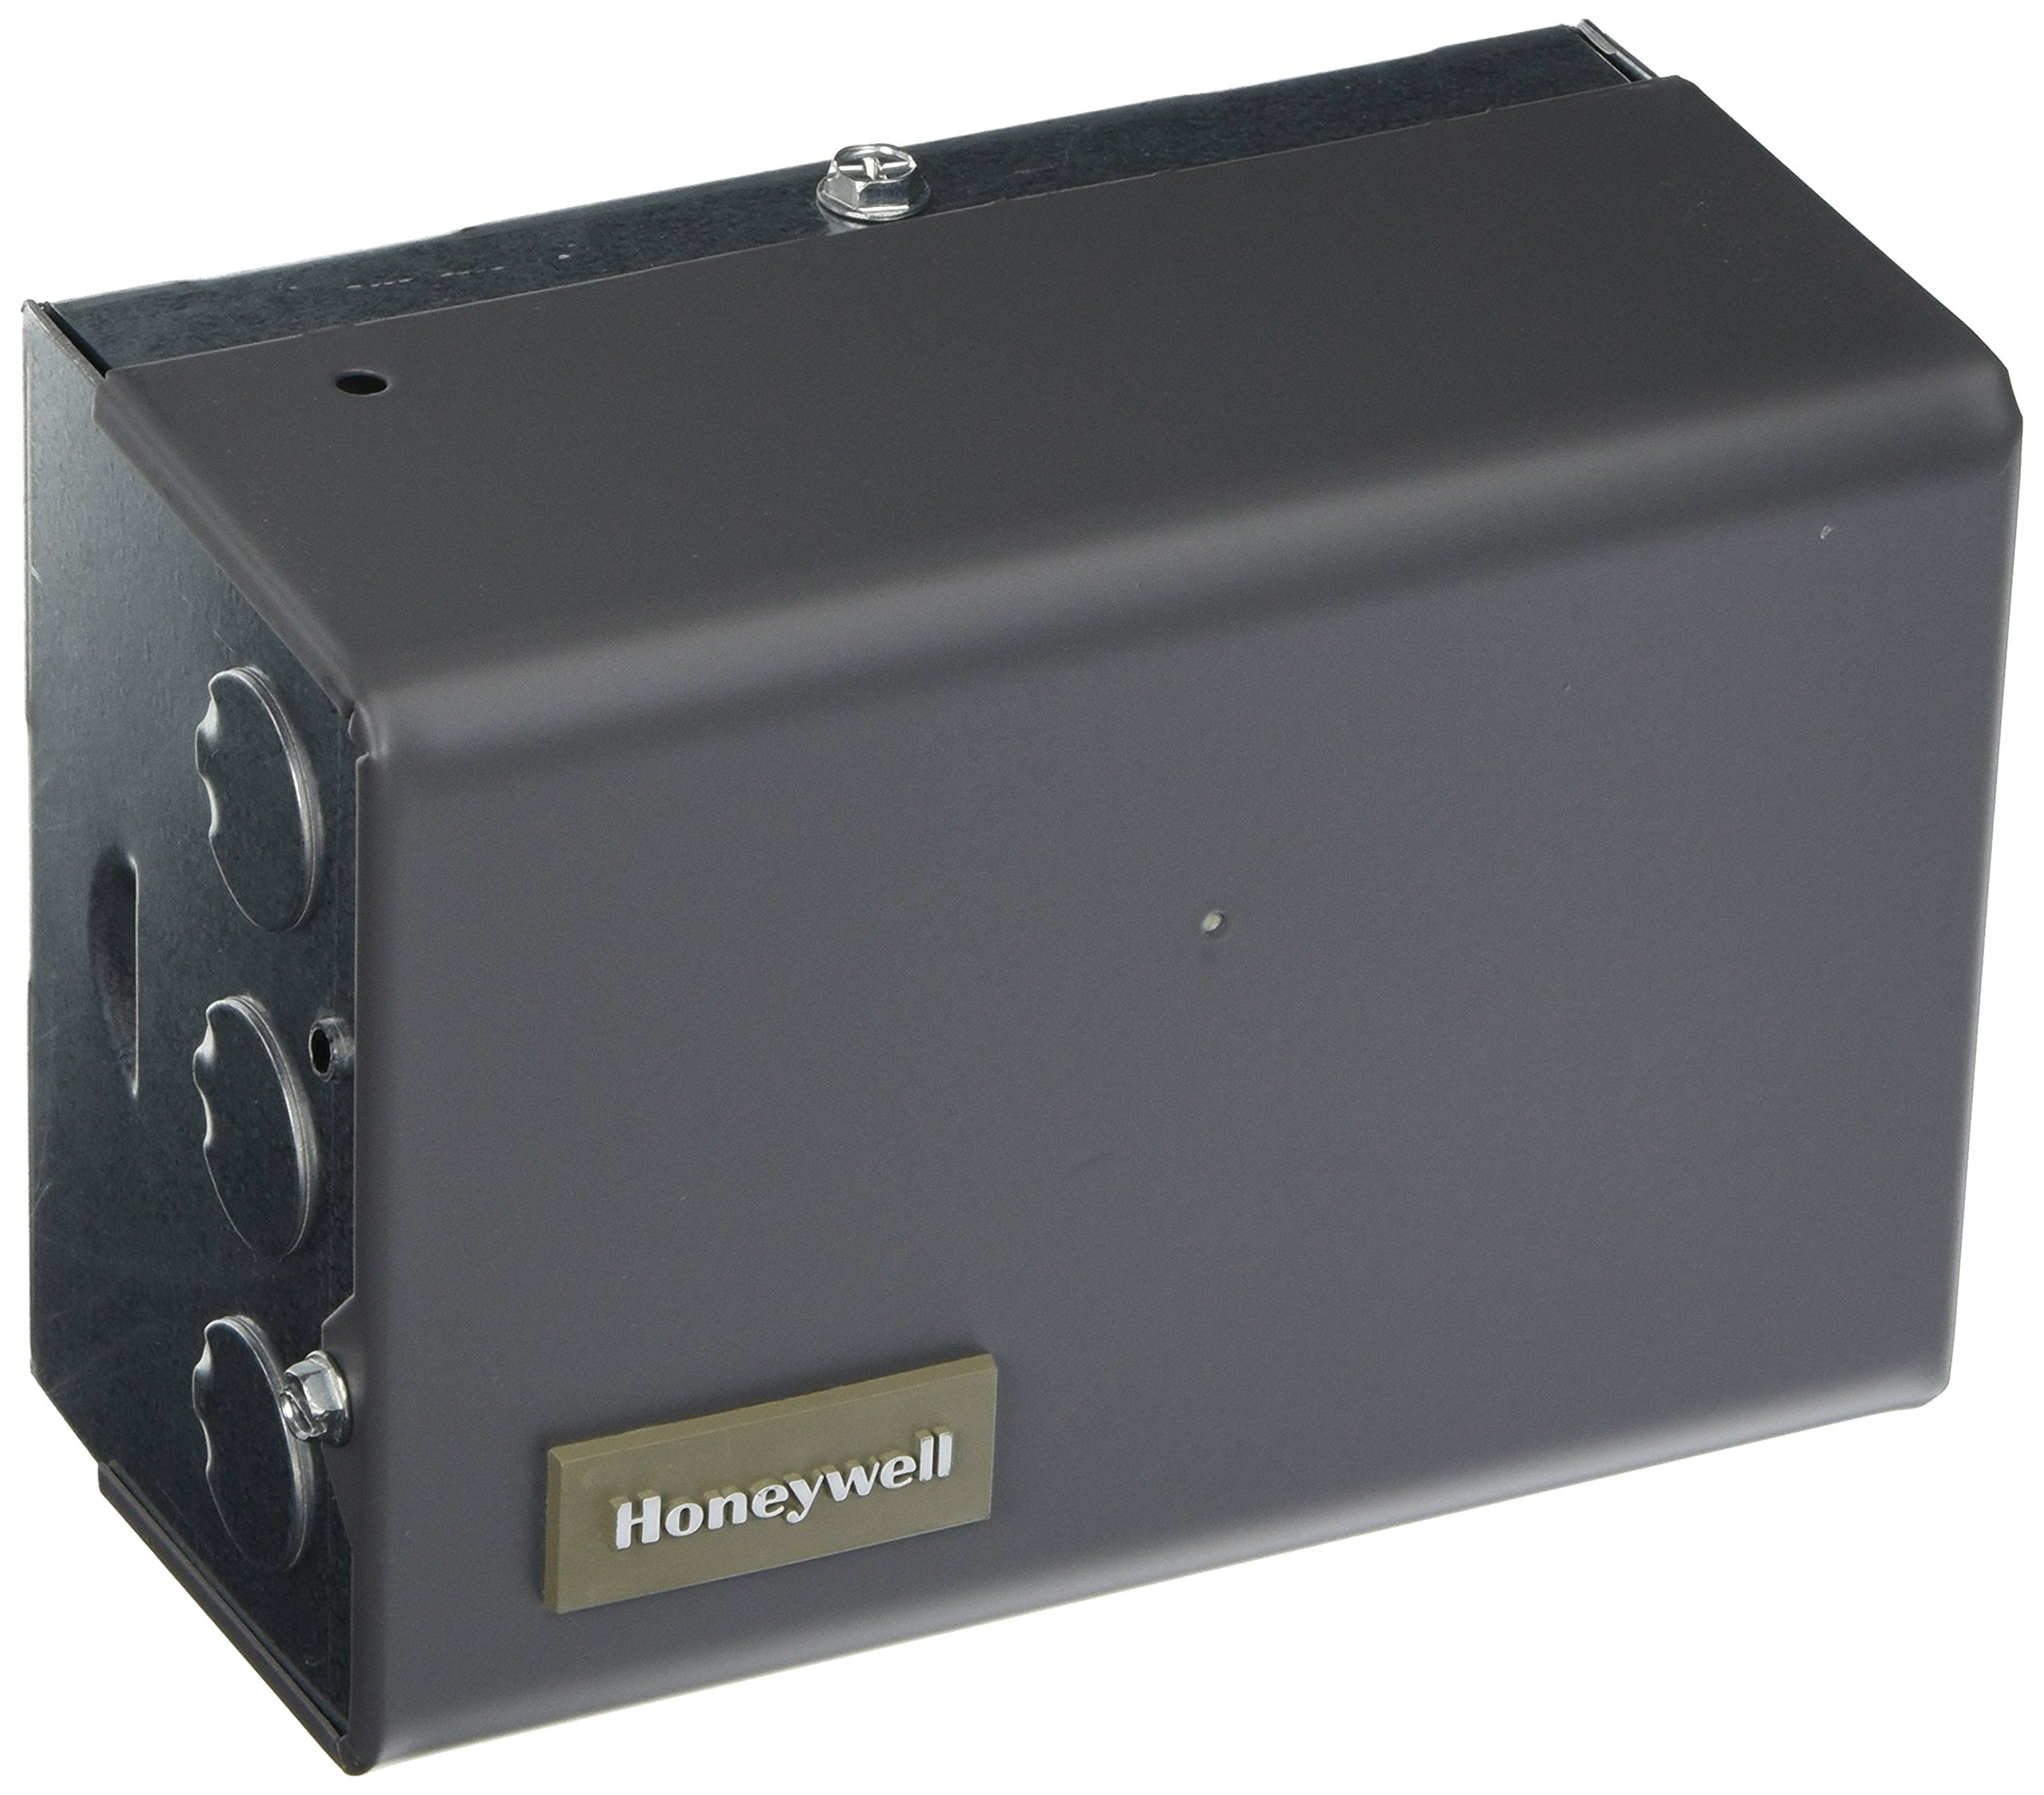 Honeywell L8124C1003 Triple Aquastat Relay High 10F Fixed: Low 10-25F